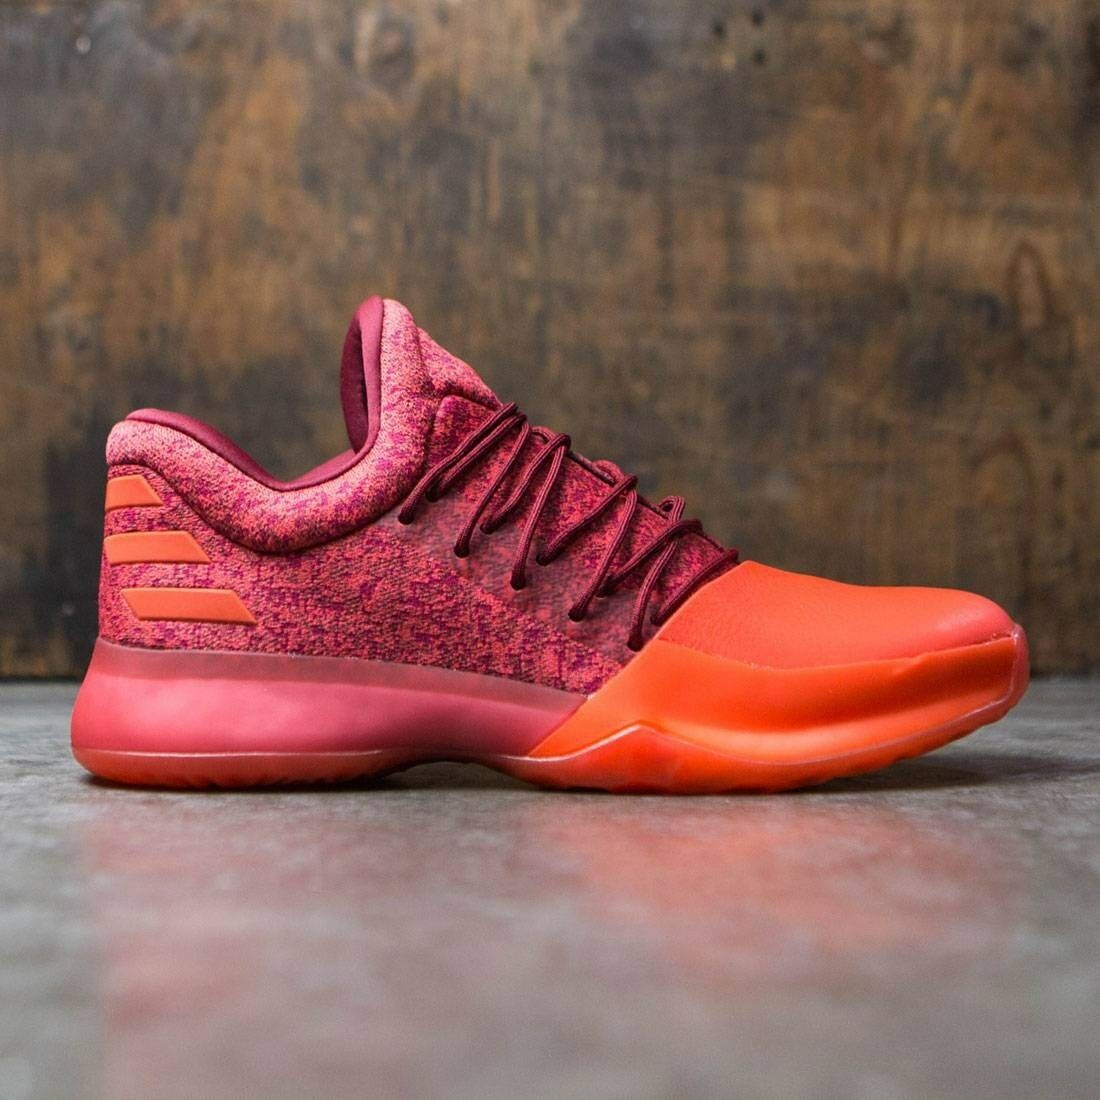 Adidas Basketball James Harden Vol.1 Red orange shoes Boost New Men NBA Sz 13